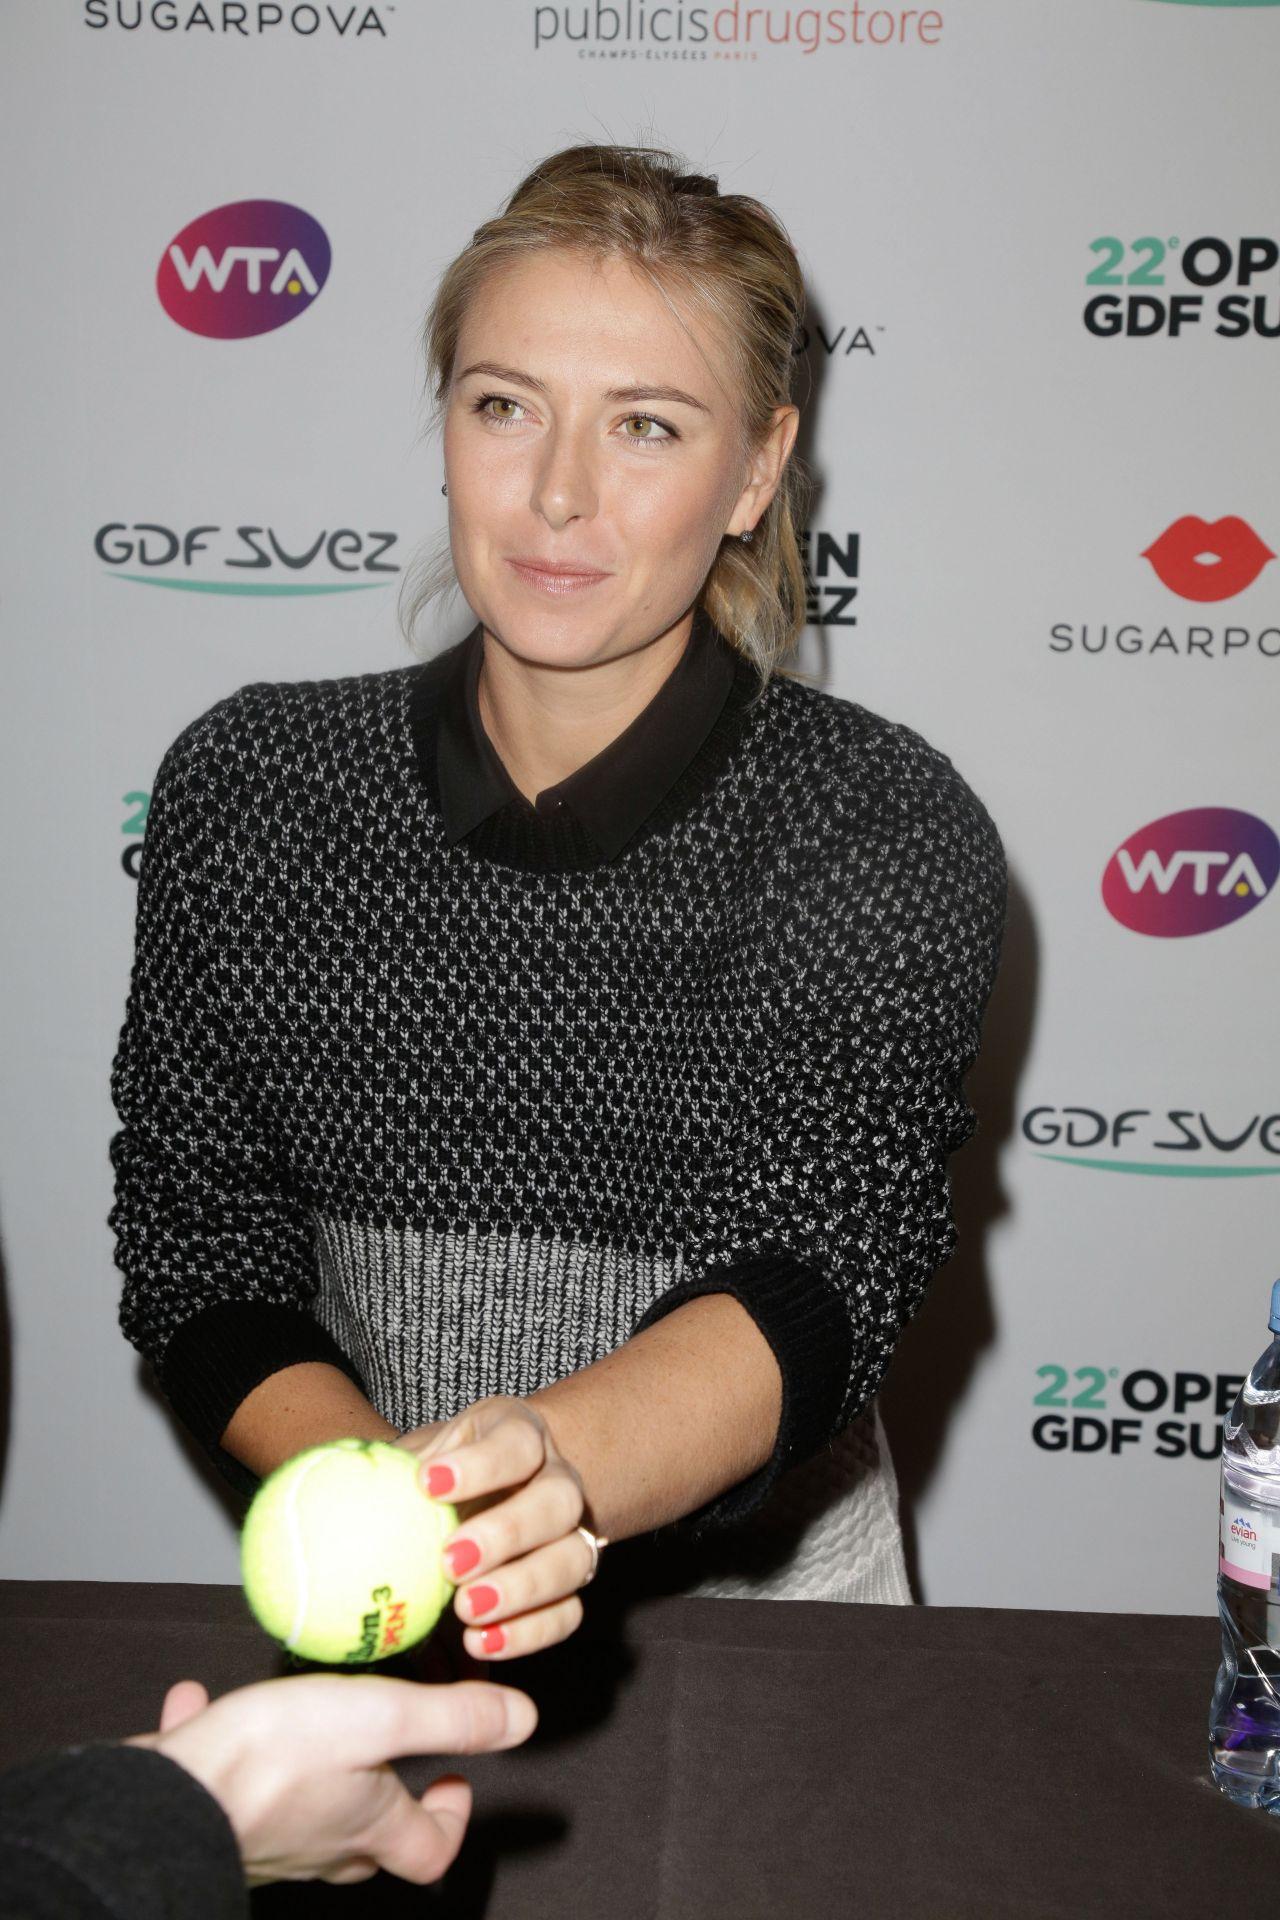 Maria Sharapova at Sugarpova Candy Collection Promotion – Paris